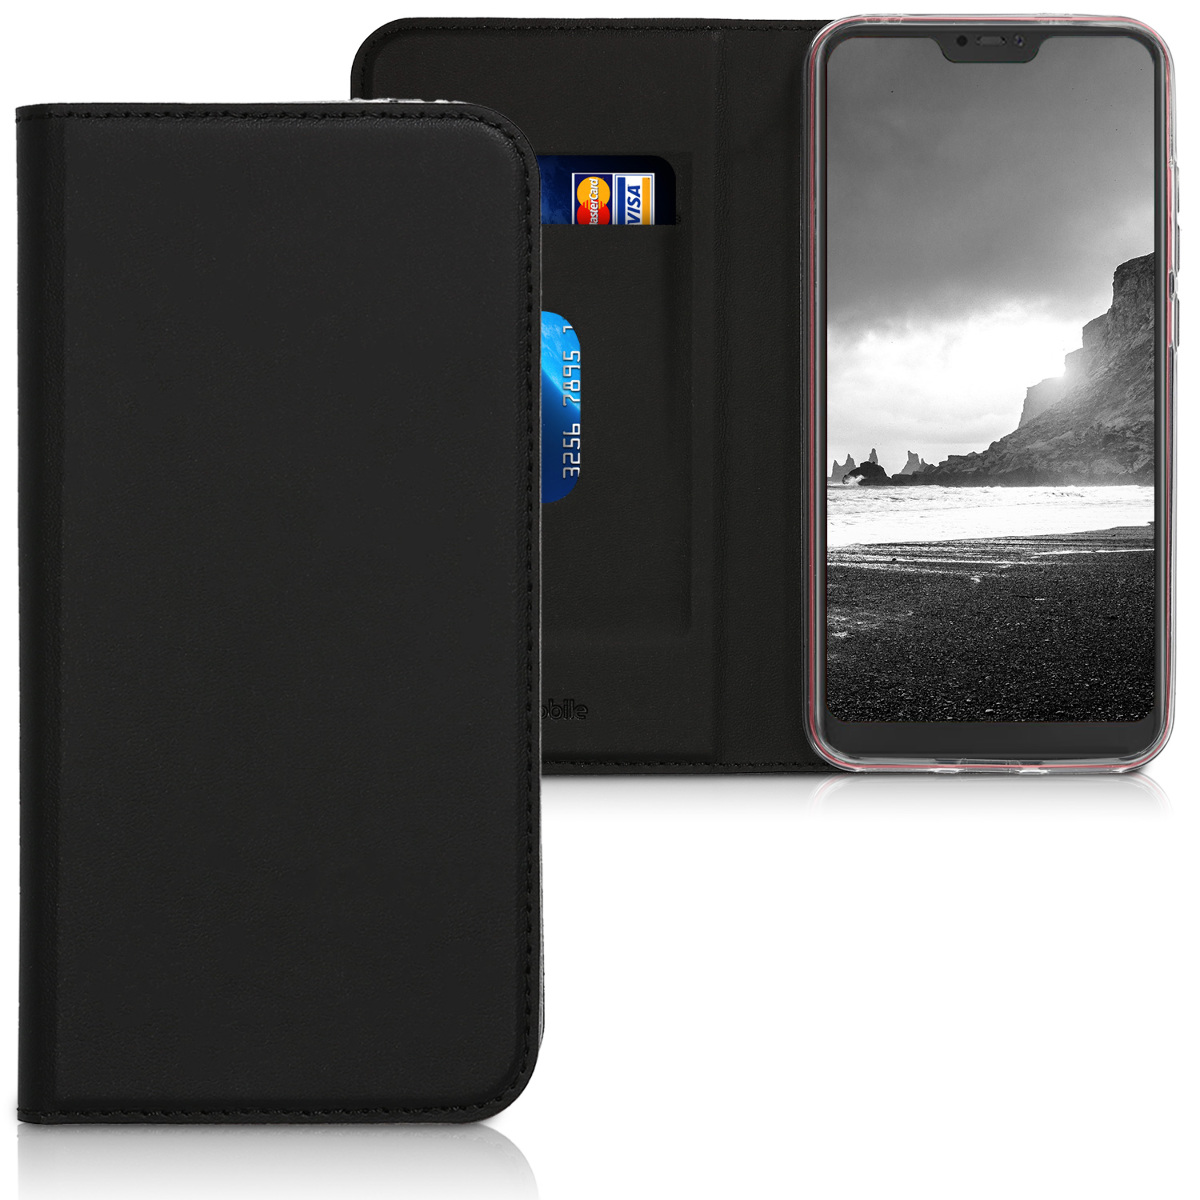 Kožené pouzdro | obal pro Xiaomi Redmi 6 Pro | Mi A2 Lite - černý